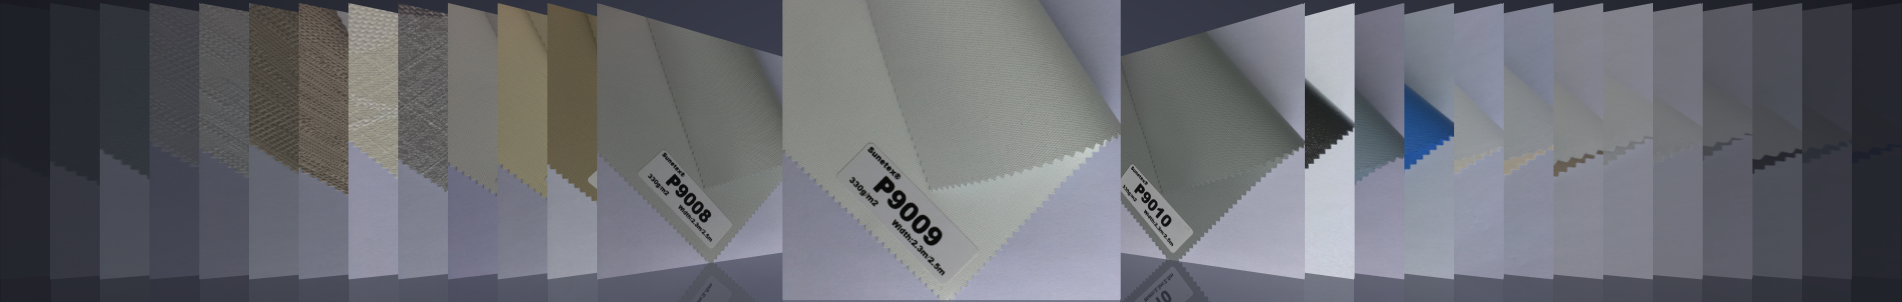 Cheap Rolling Curtain Fabric